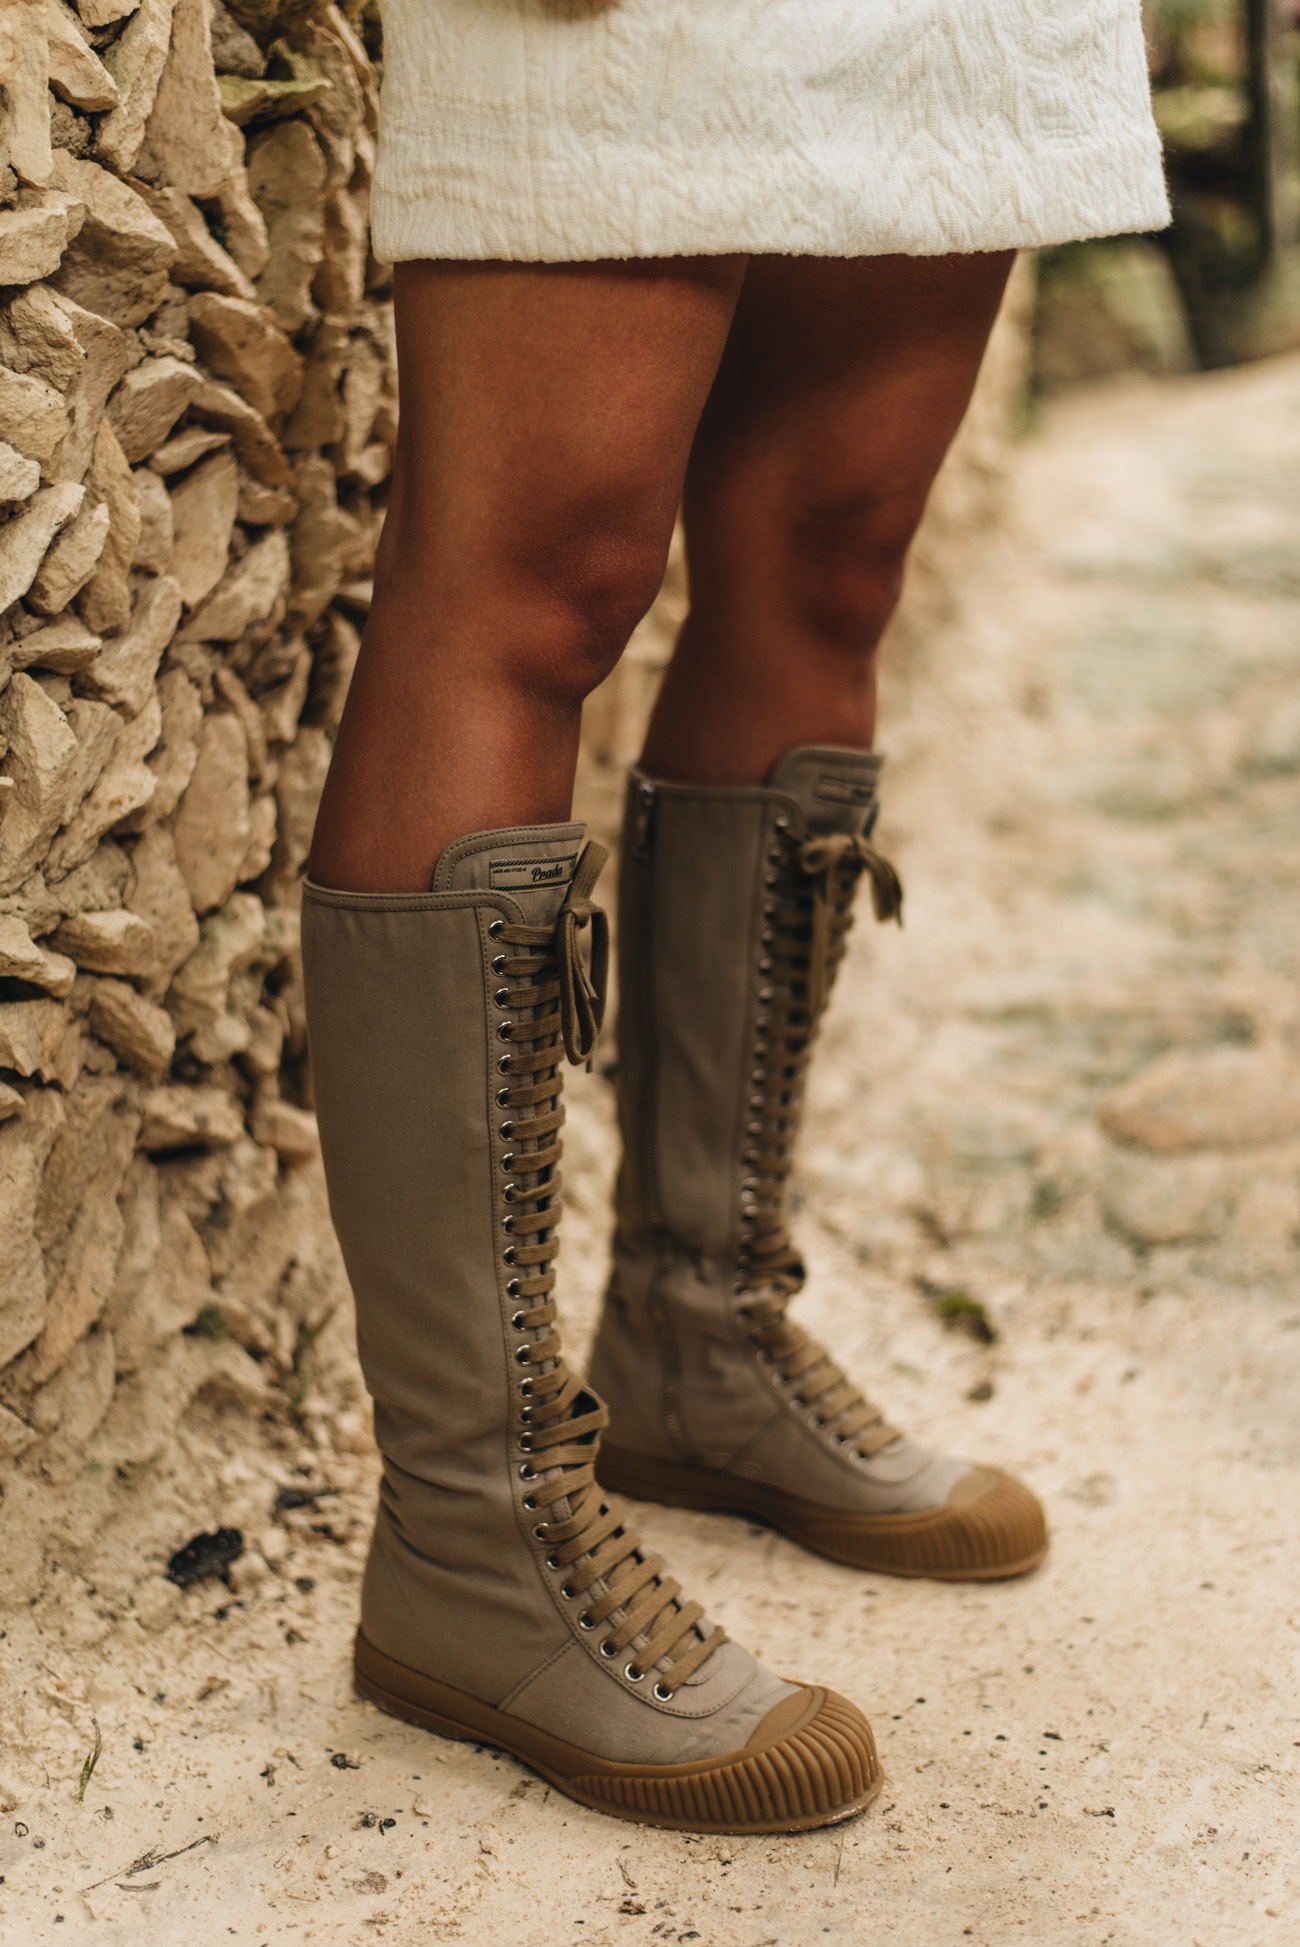 Fashion-editorial-shooting-Mode-Blogger-Fotoshooting-outdoor-tulum-dschungel-palmen-fashiioncarpet-nina-schwichtenberg